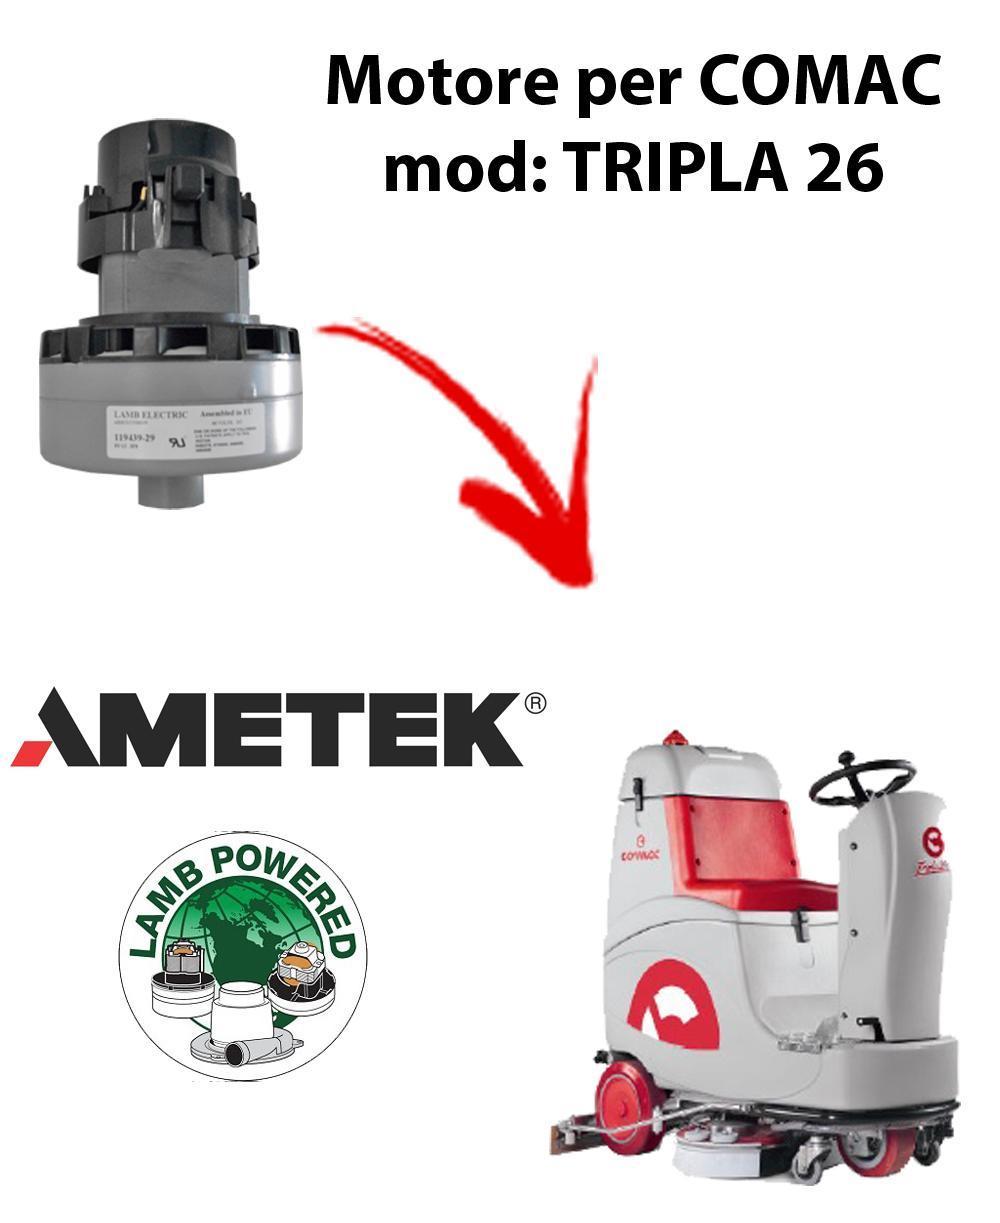 TRIPLA 26 Saugmotor AMETEK für scheuersaugmaschinen Comac